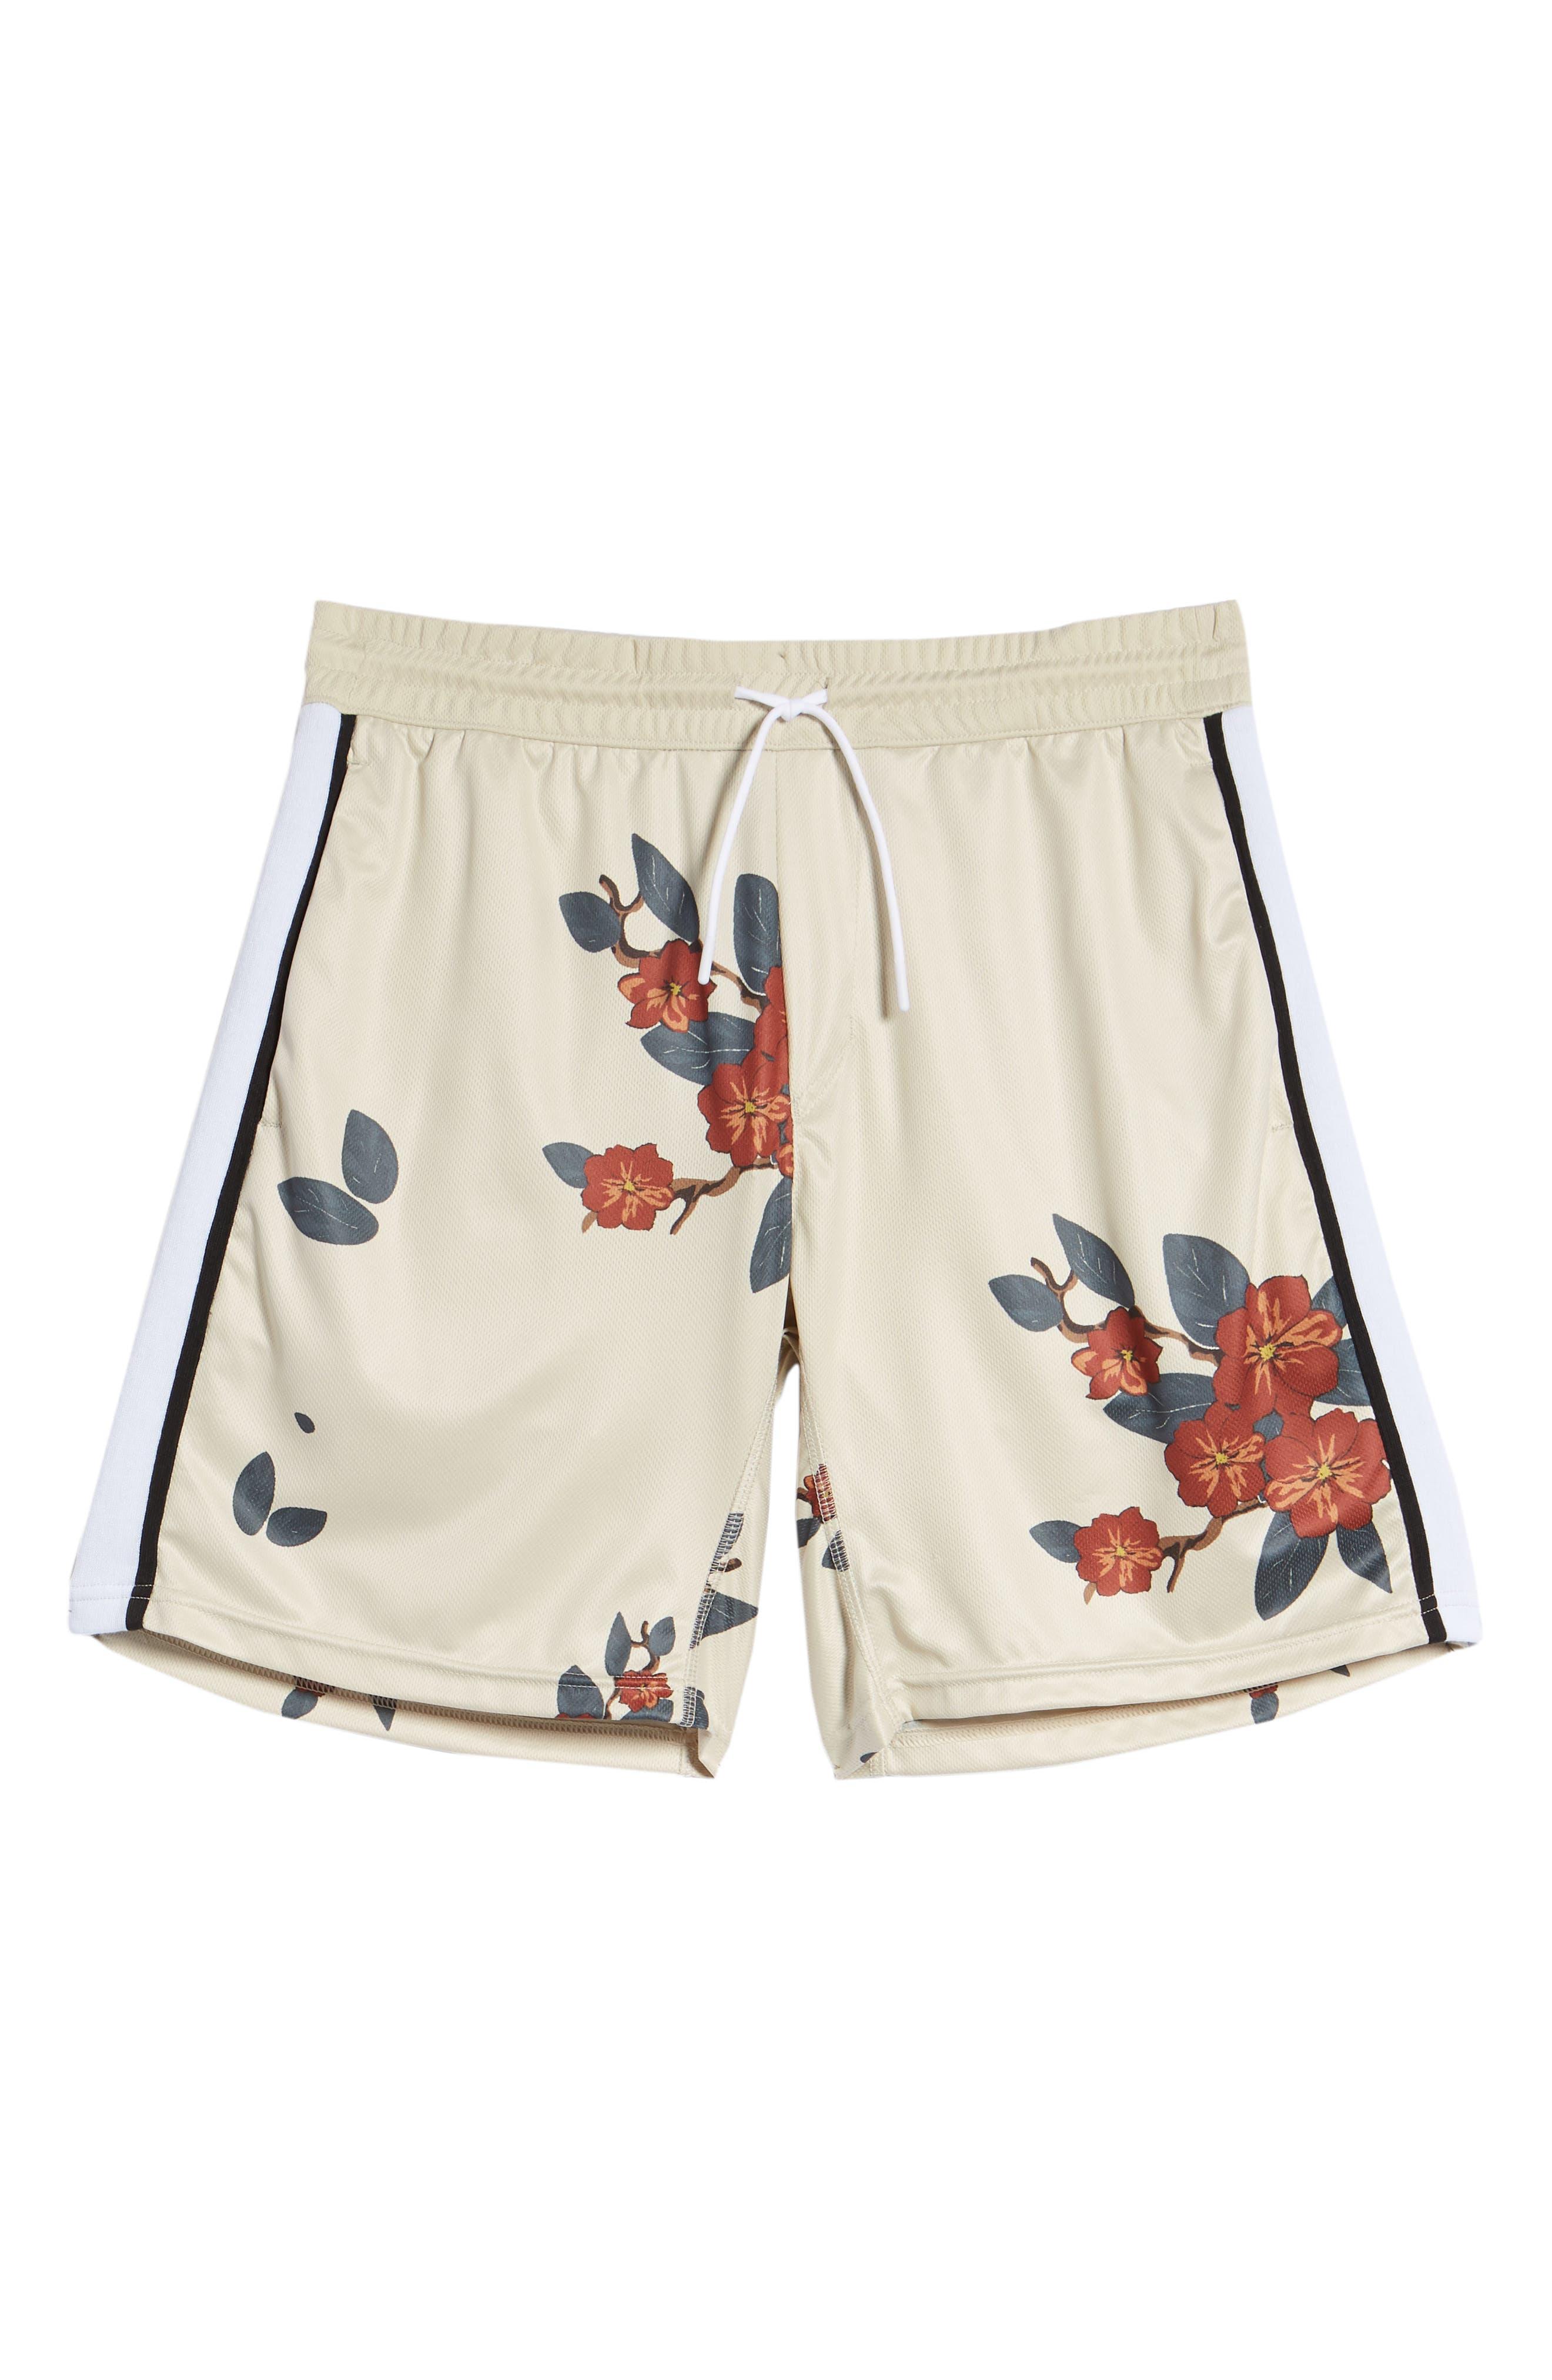 Bloom Sideline Shorts,                             Alternate thumbnail 6, color,                             901